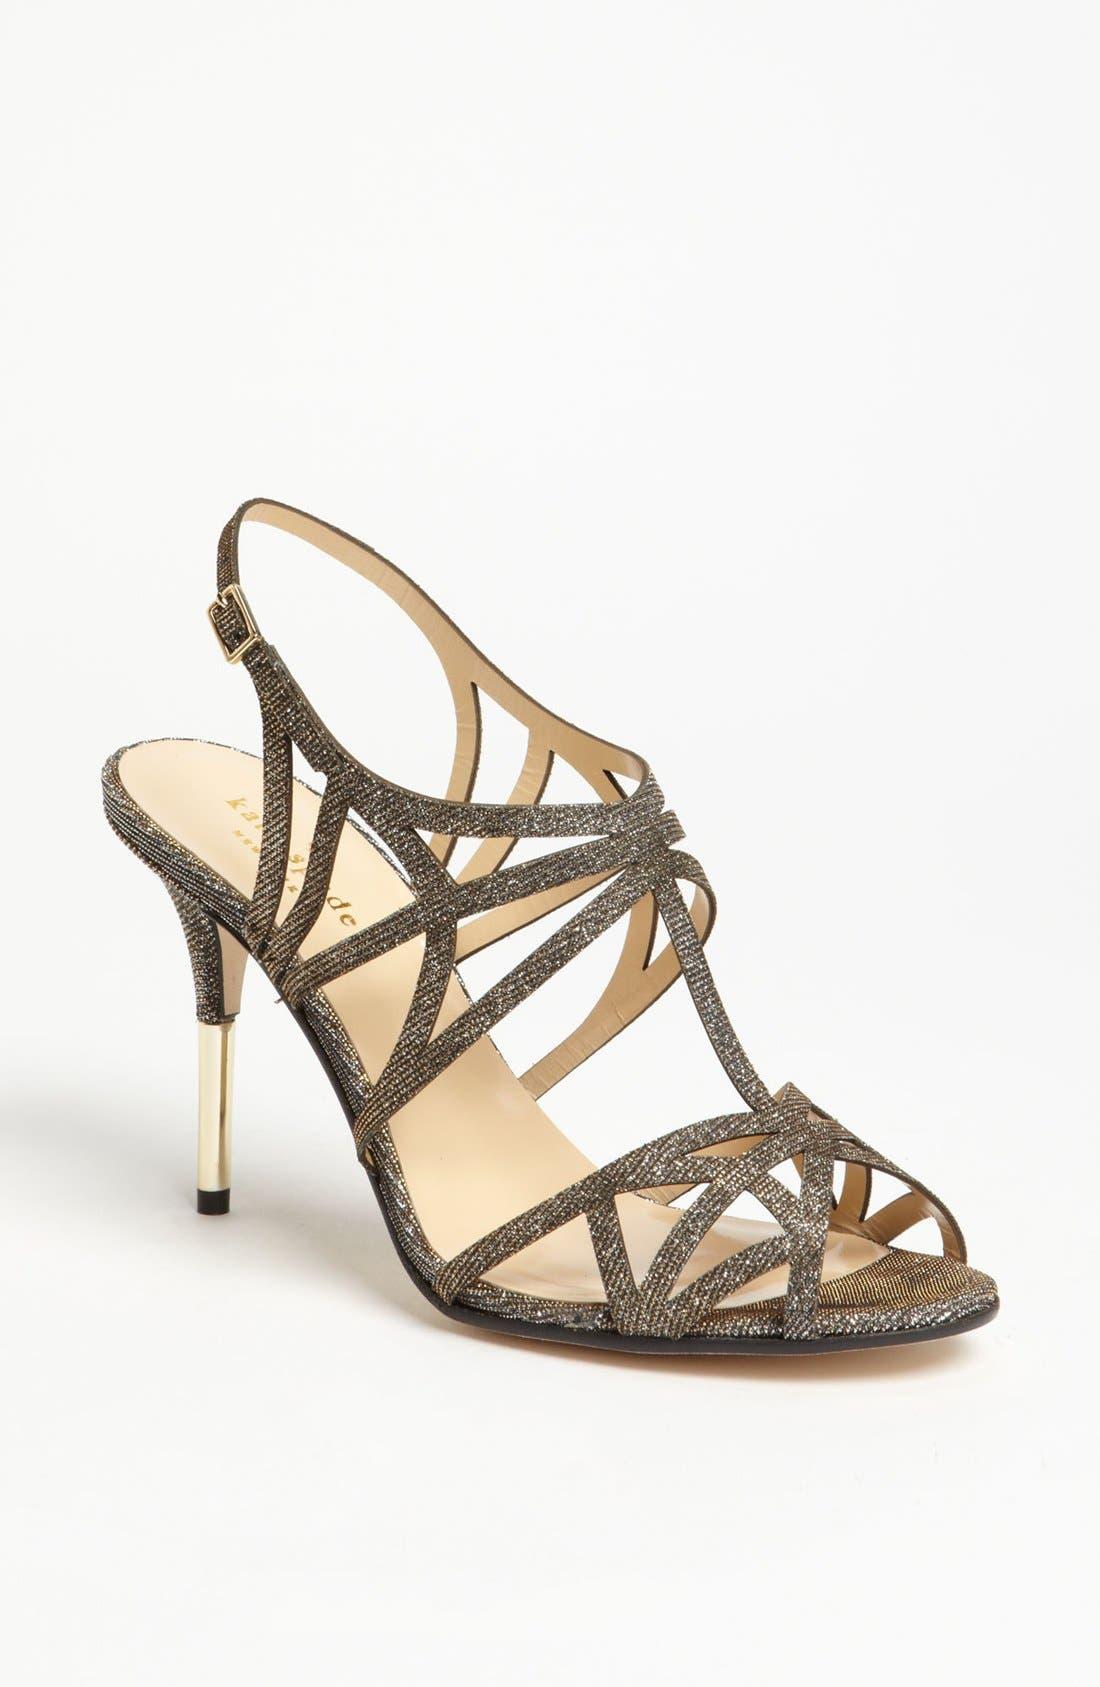 Main Image - kate spade new york 'issa' sandal